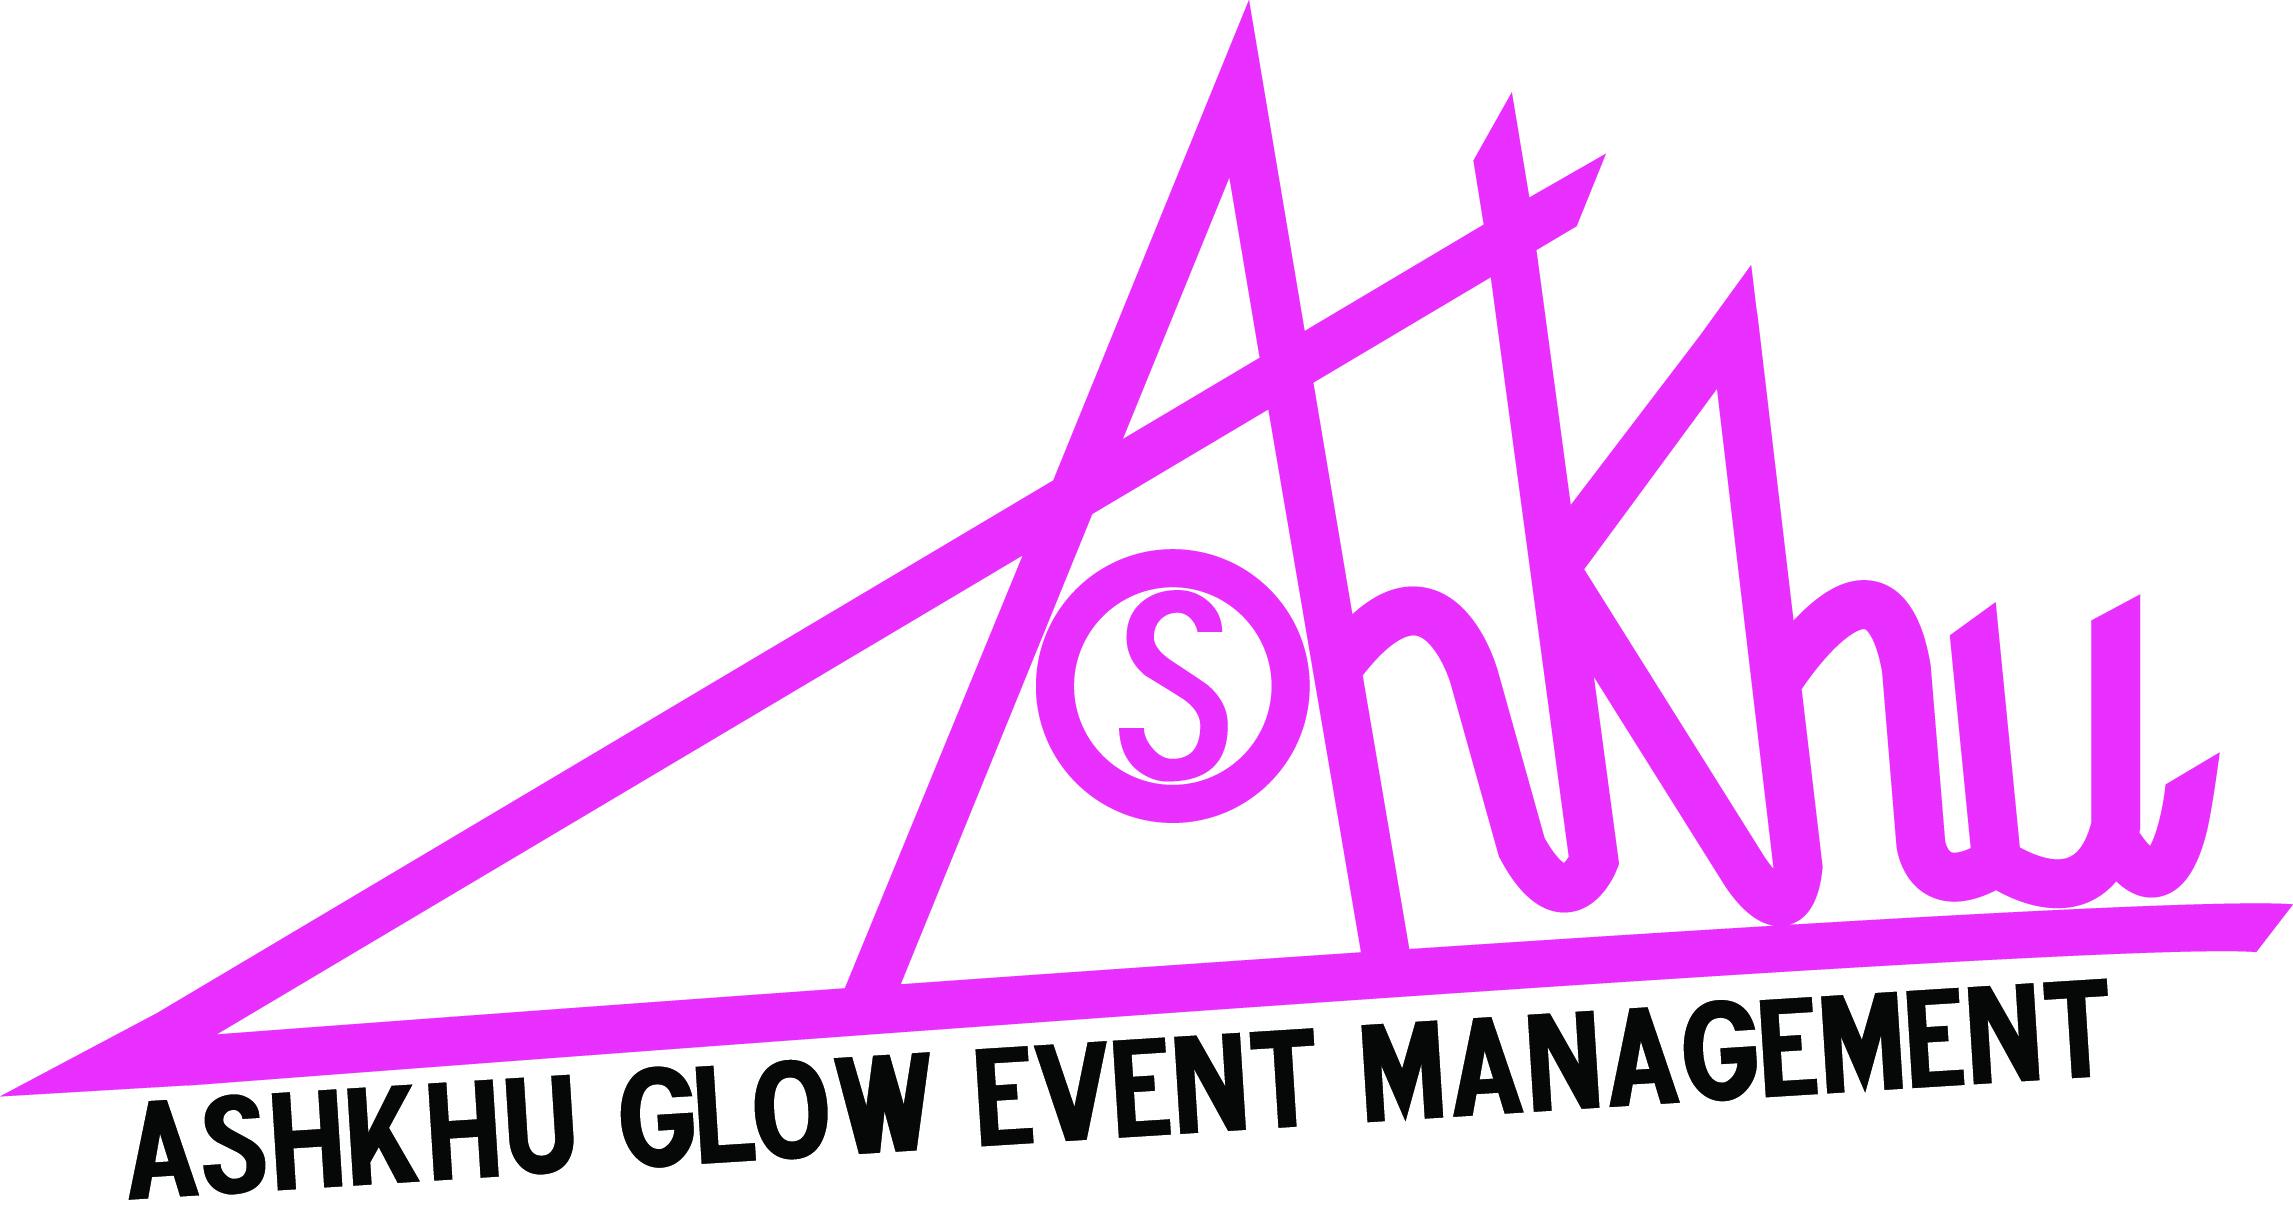 Ashku Glow Event Management